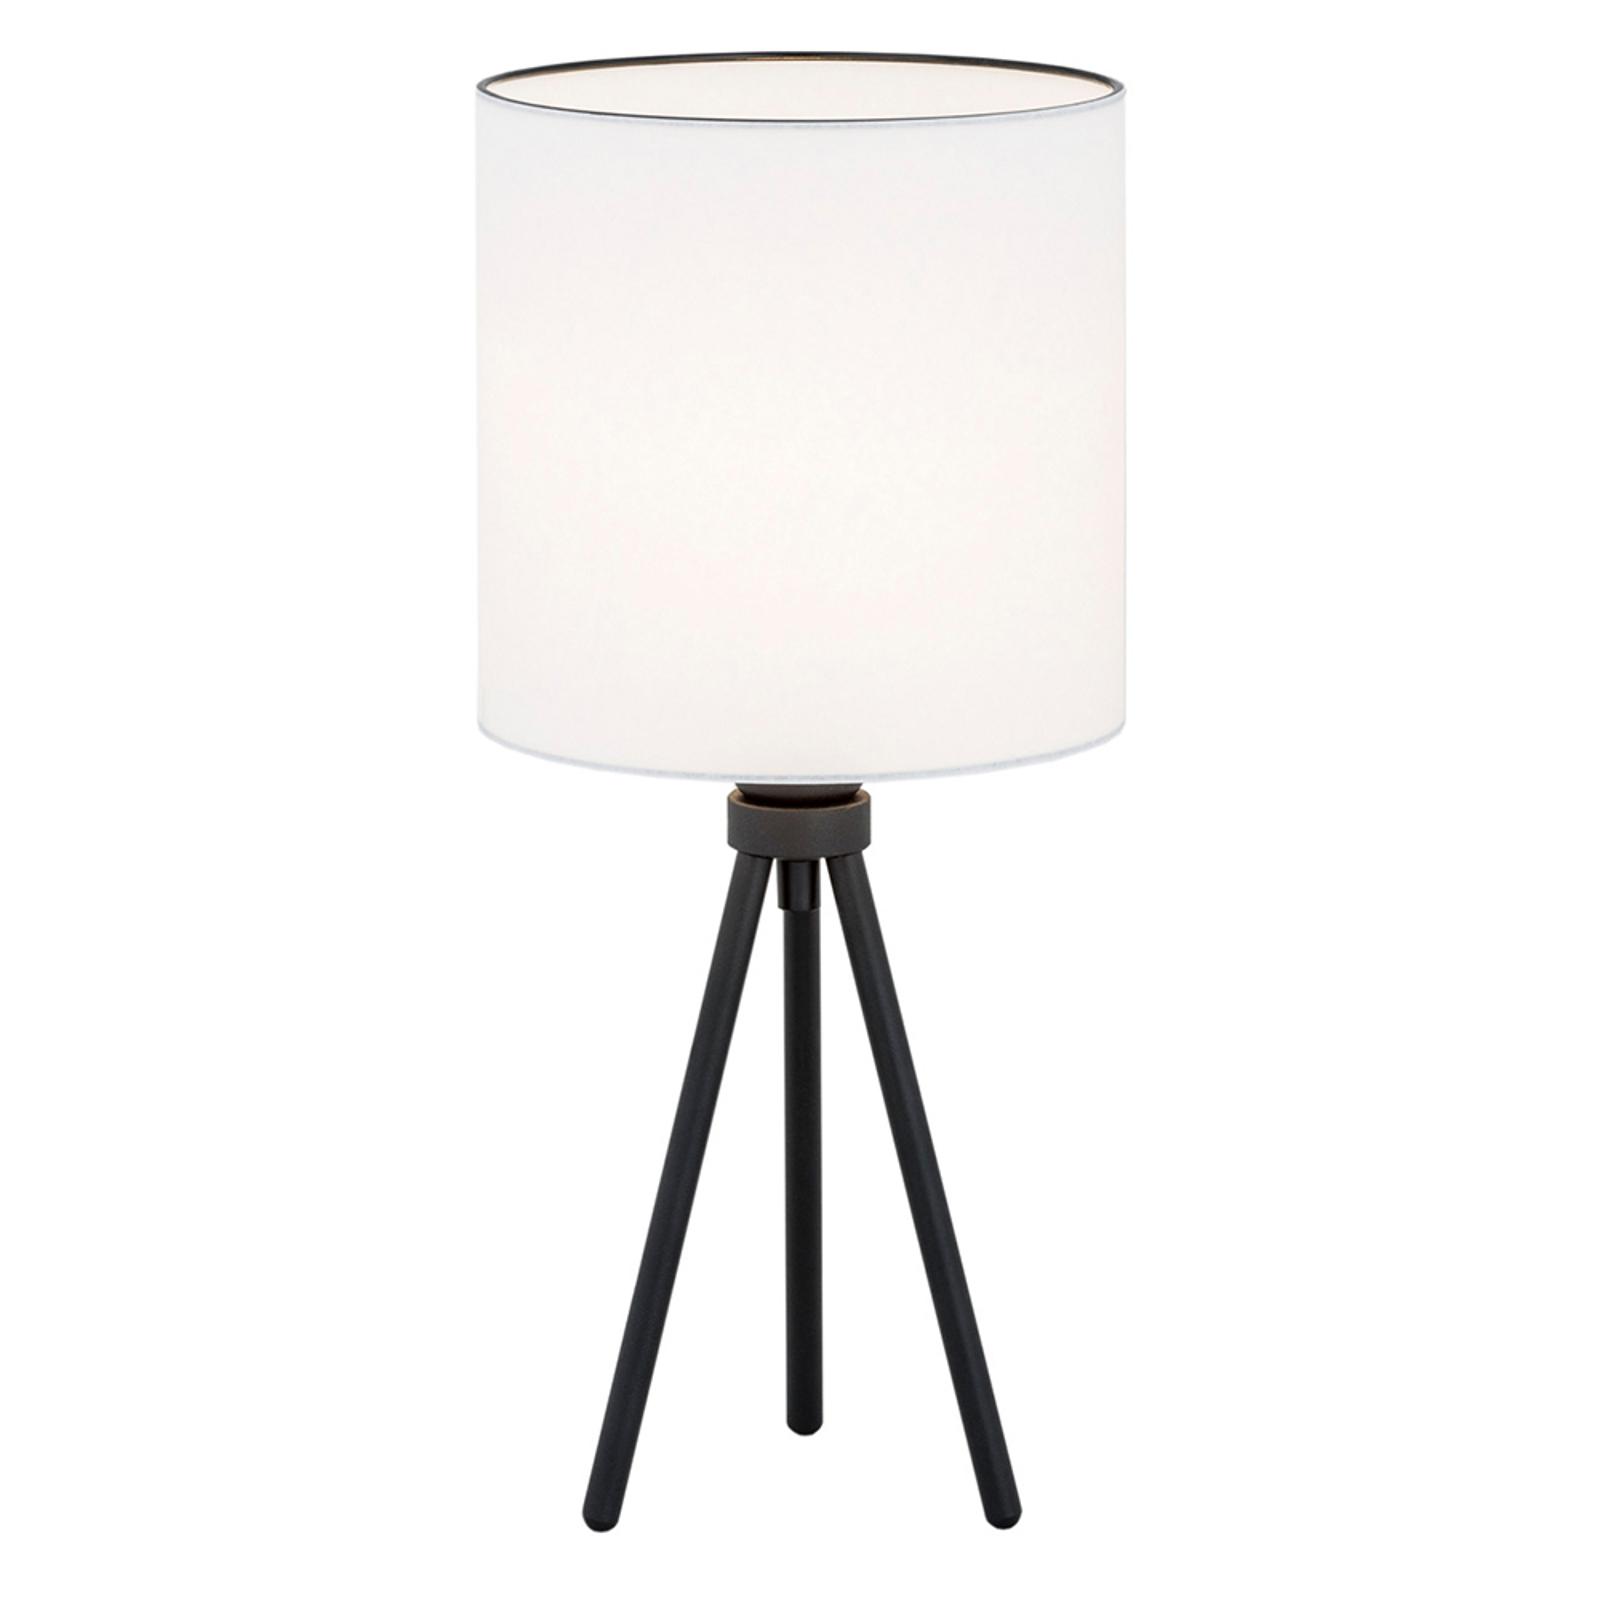 Lampa stołowa Harris, trójnóg, czarna/biała